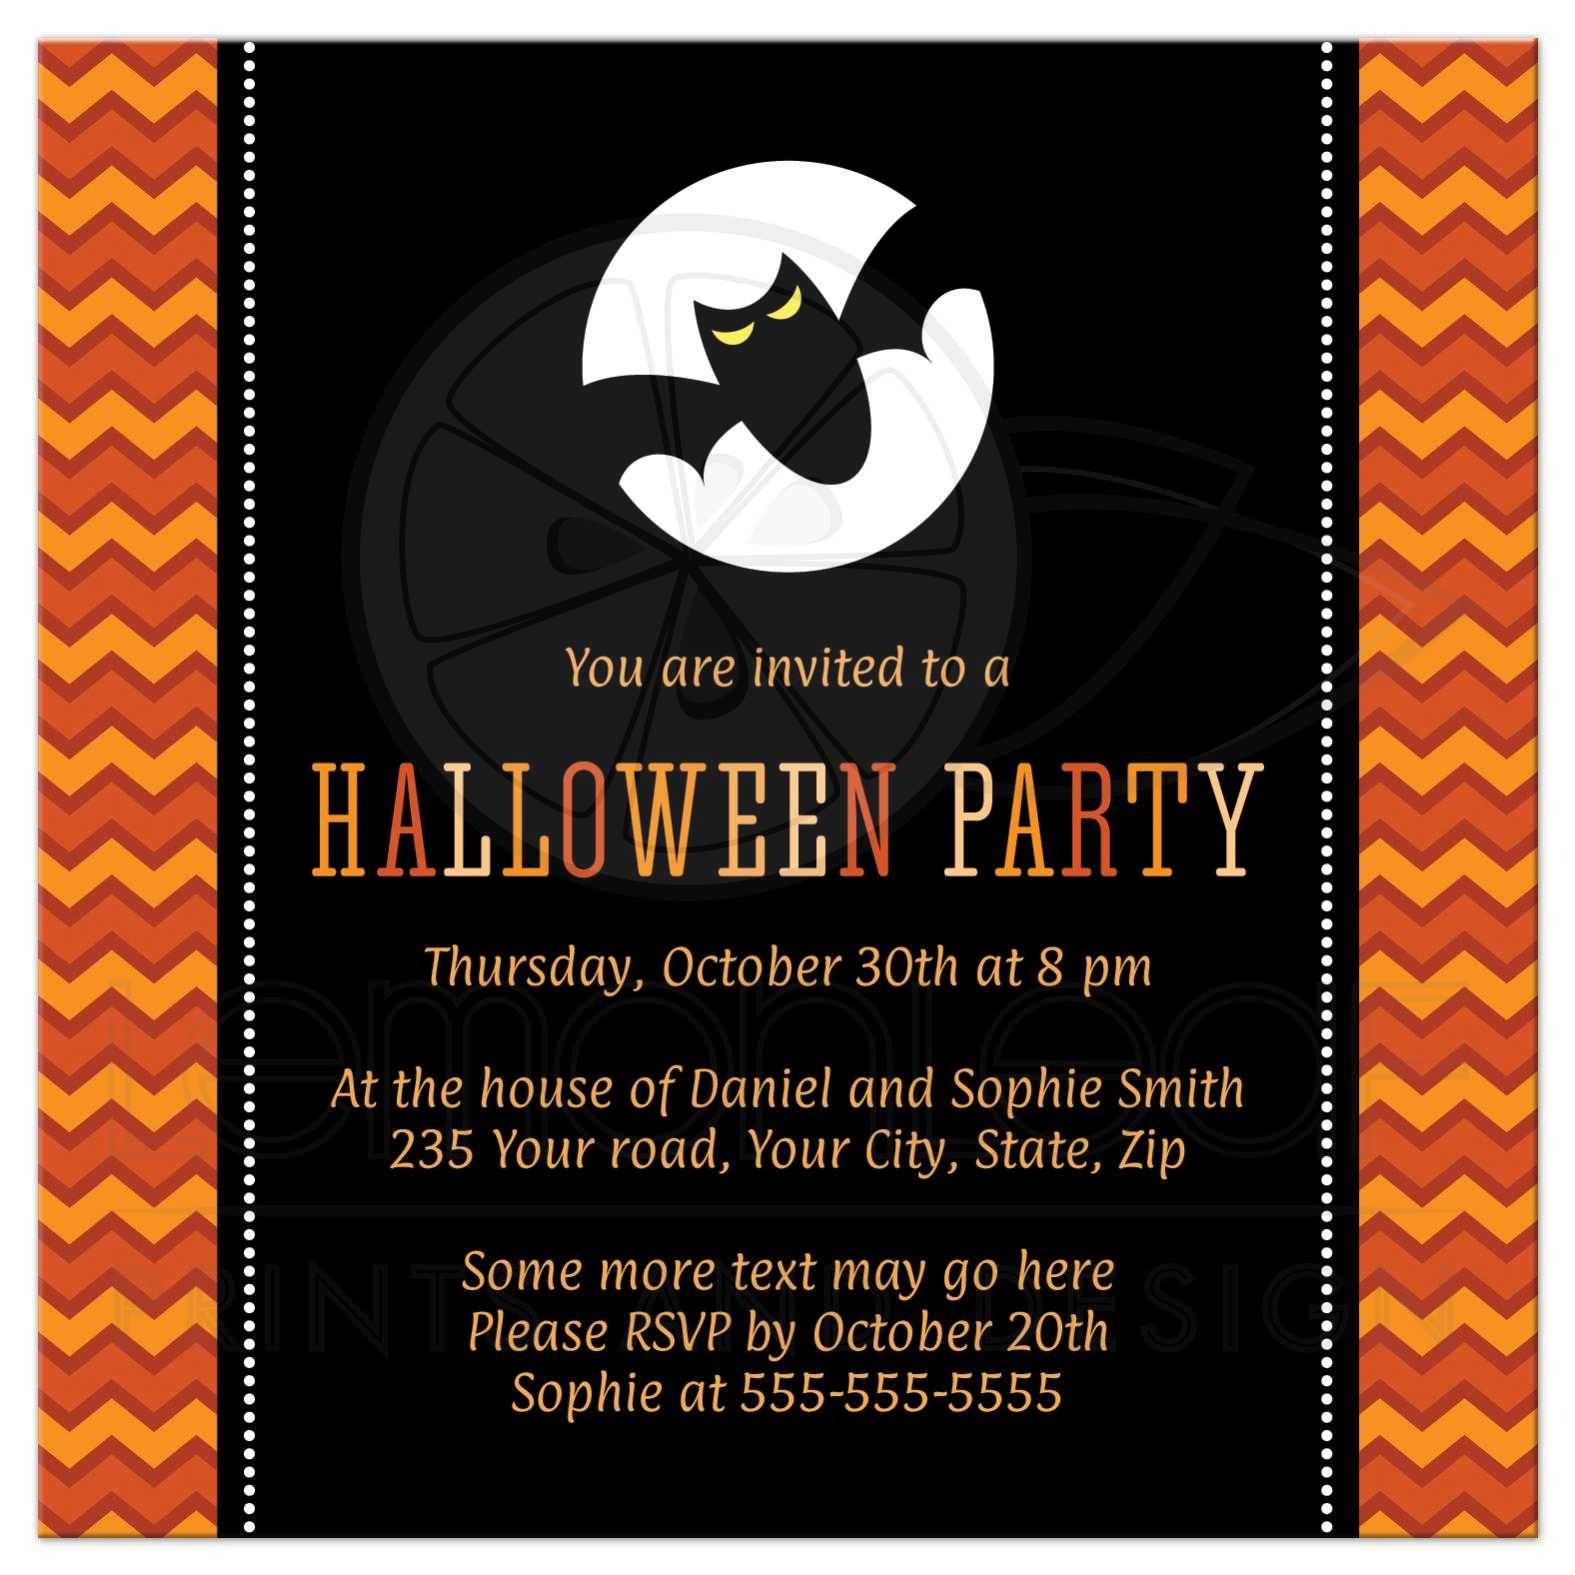 Halloween party invitation with orange chevron zigzag pattern and bat